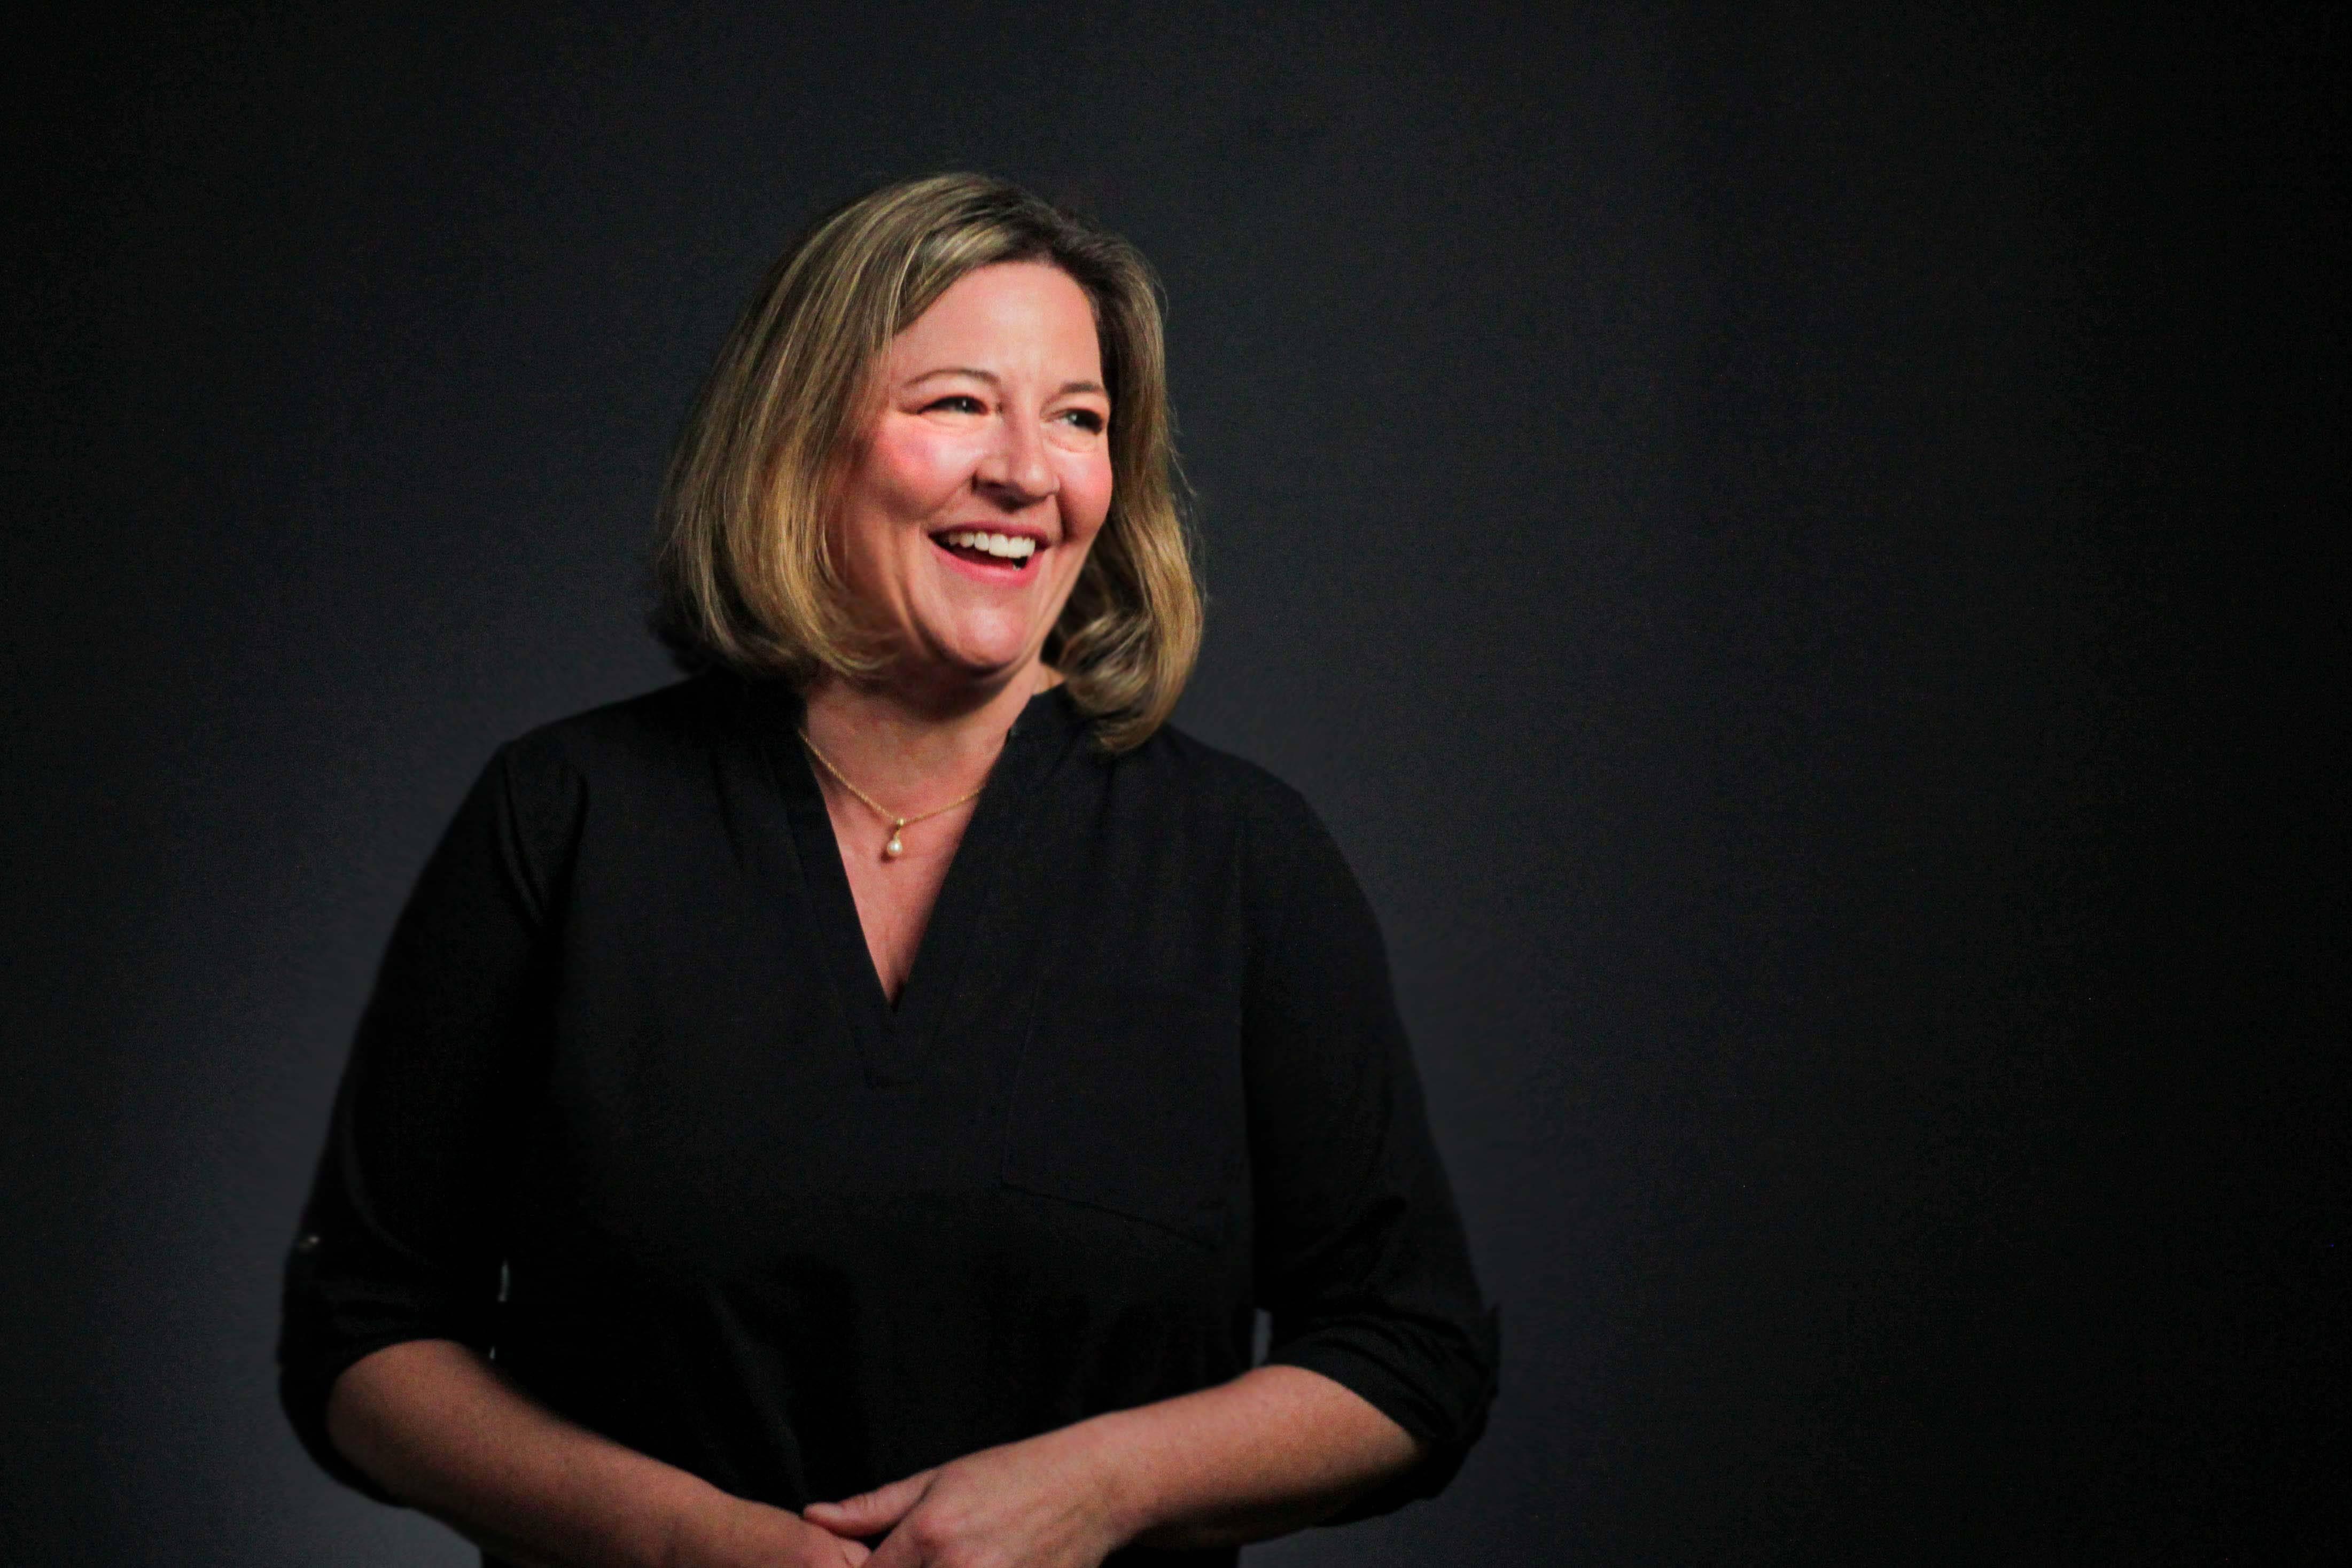 Amy Burkholder